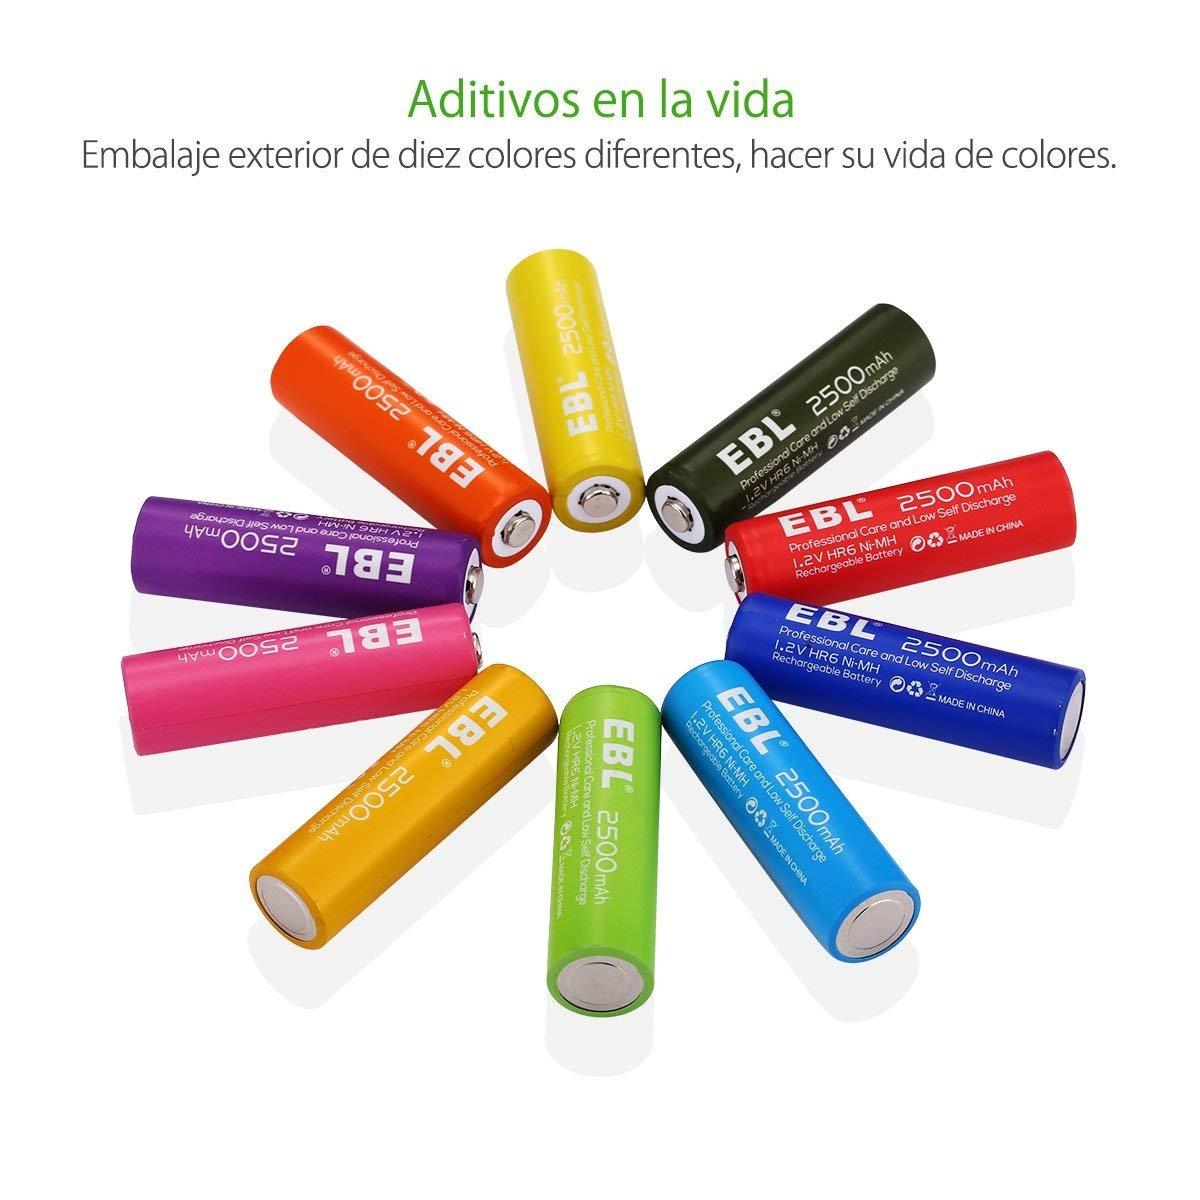 EBL 2500mAh AA Ni-MH Arco iris de la Batería Recargable para los Equipos Domésticos (Paquete de 10 Unidades)